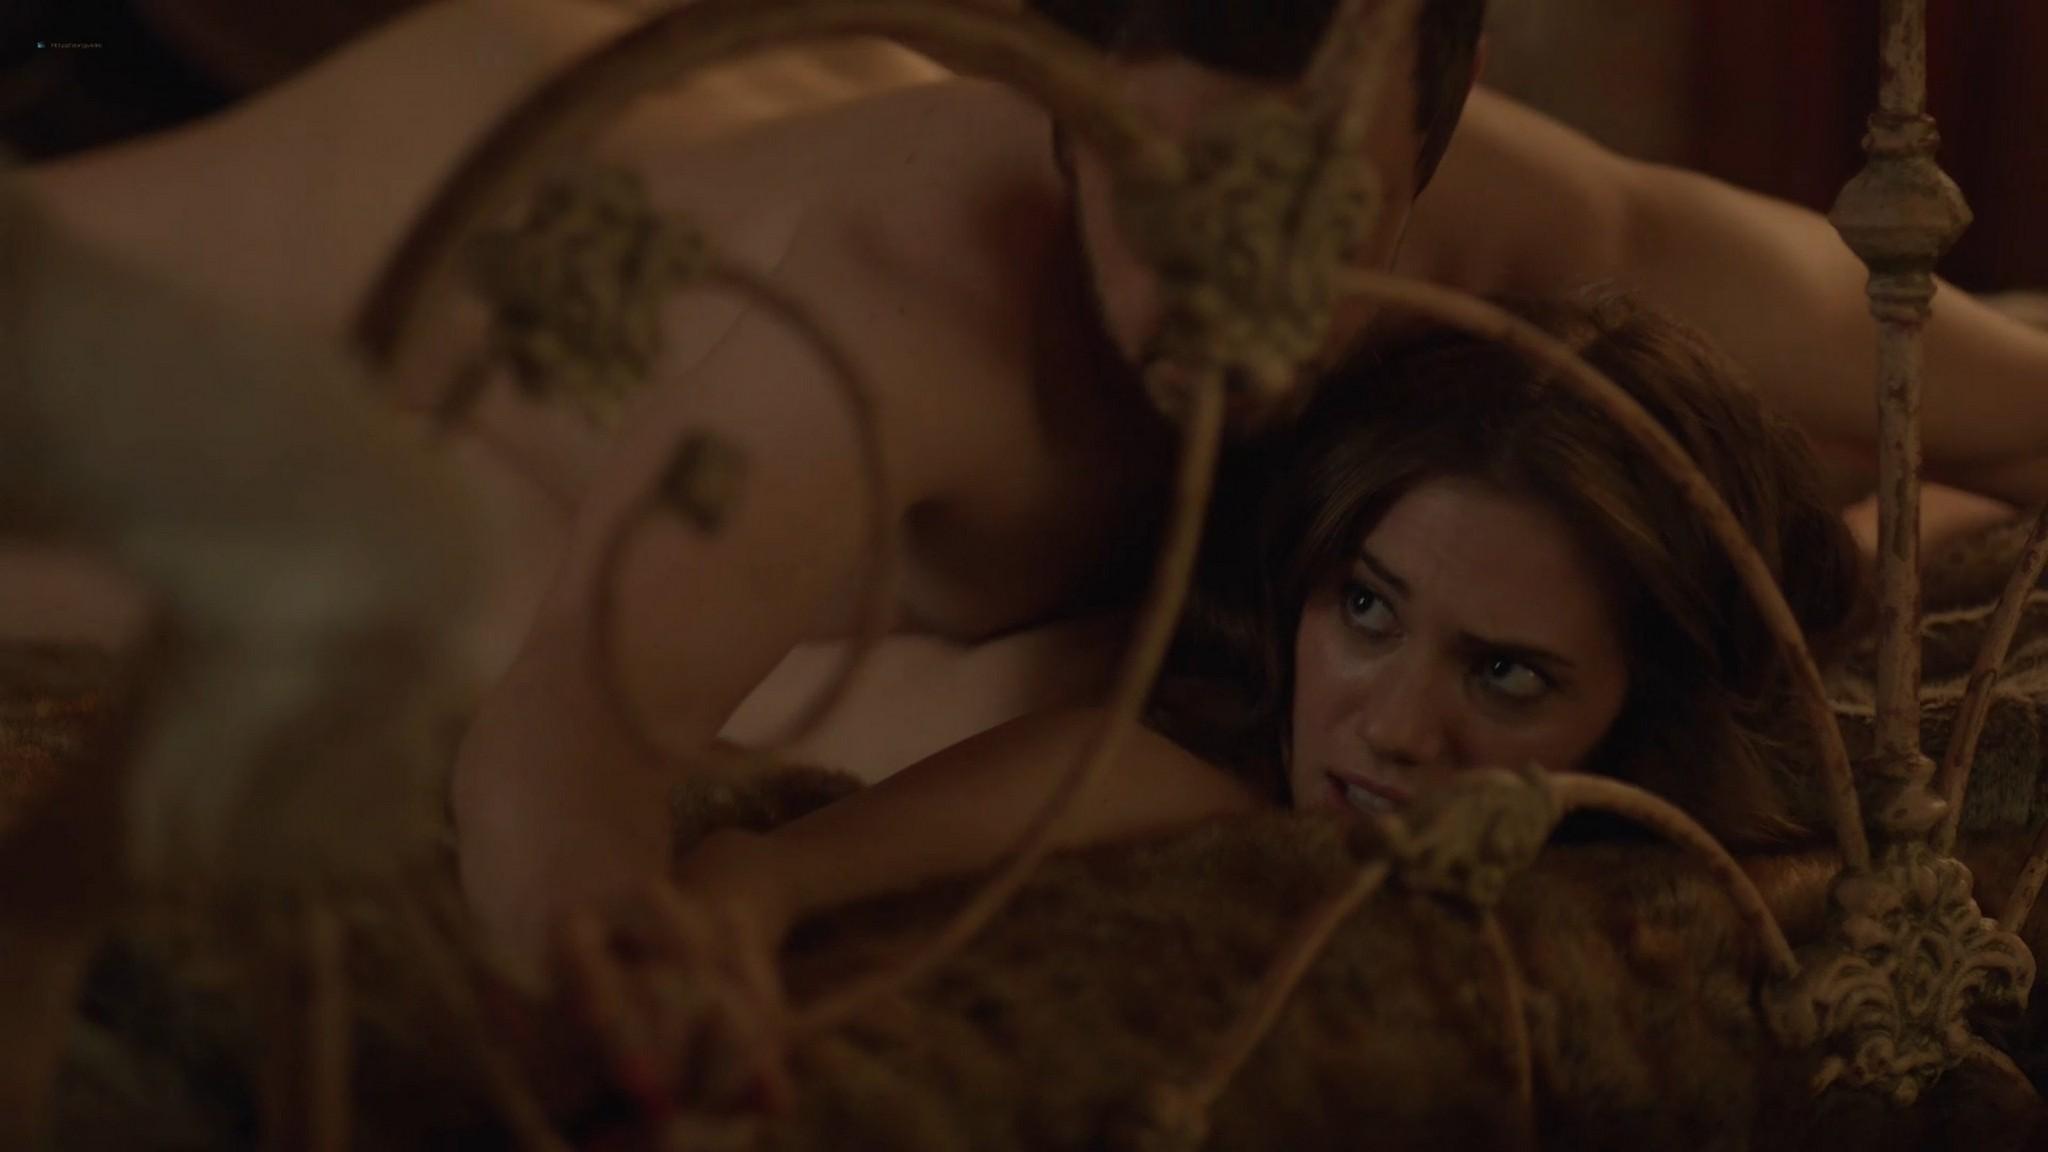 Allison Williams sex Lena Dunham nude Zosia Mamet hot Jemima Kirke nude Girls 2012 s2e1 5 1080p Web 8